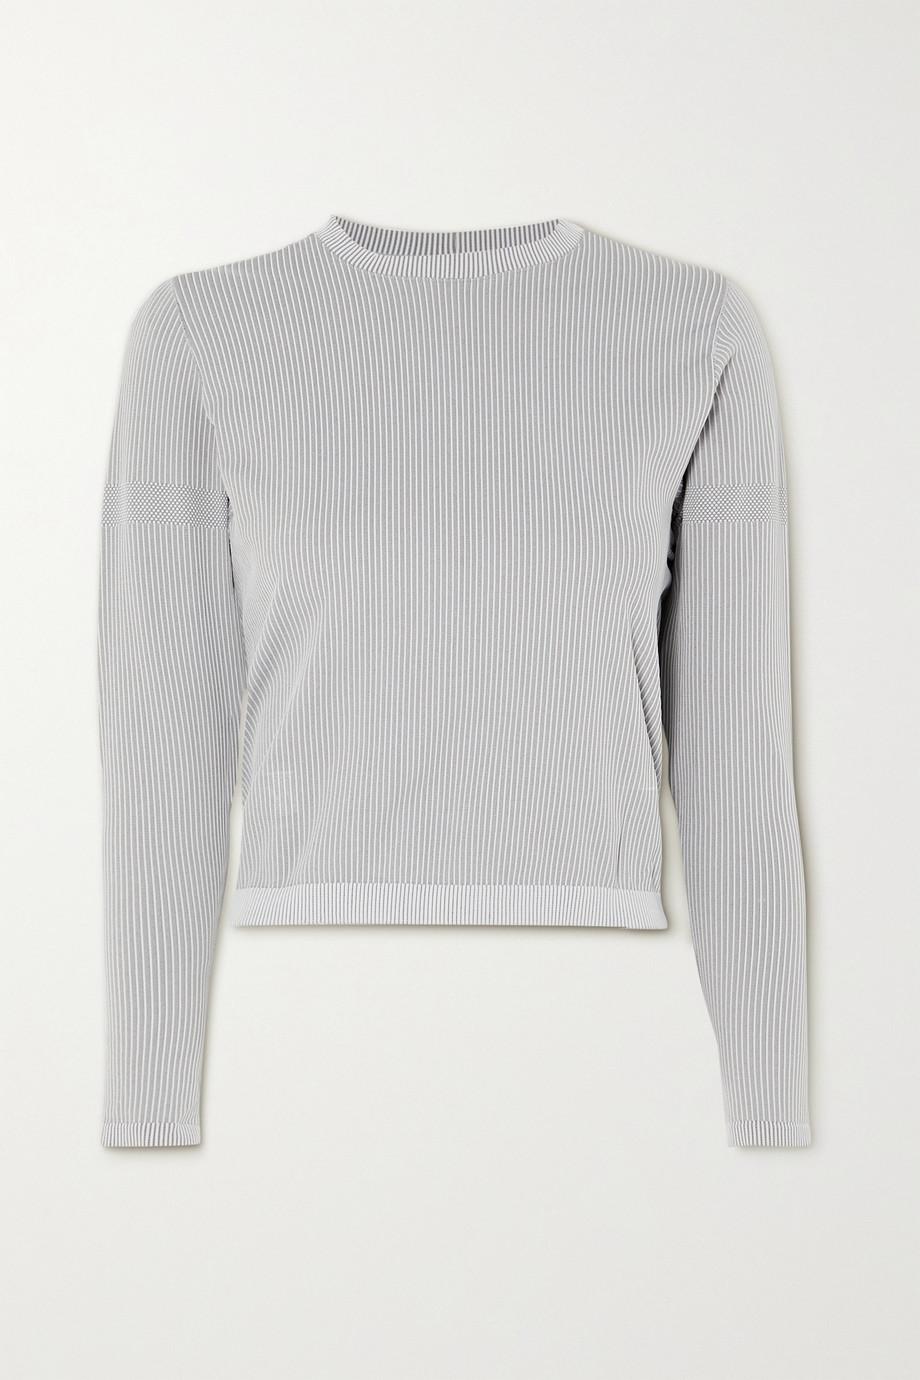 Cordova Signature ribbed stretch-knit top